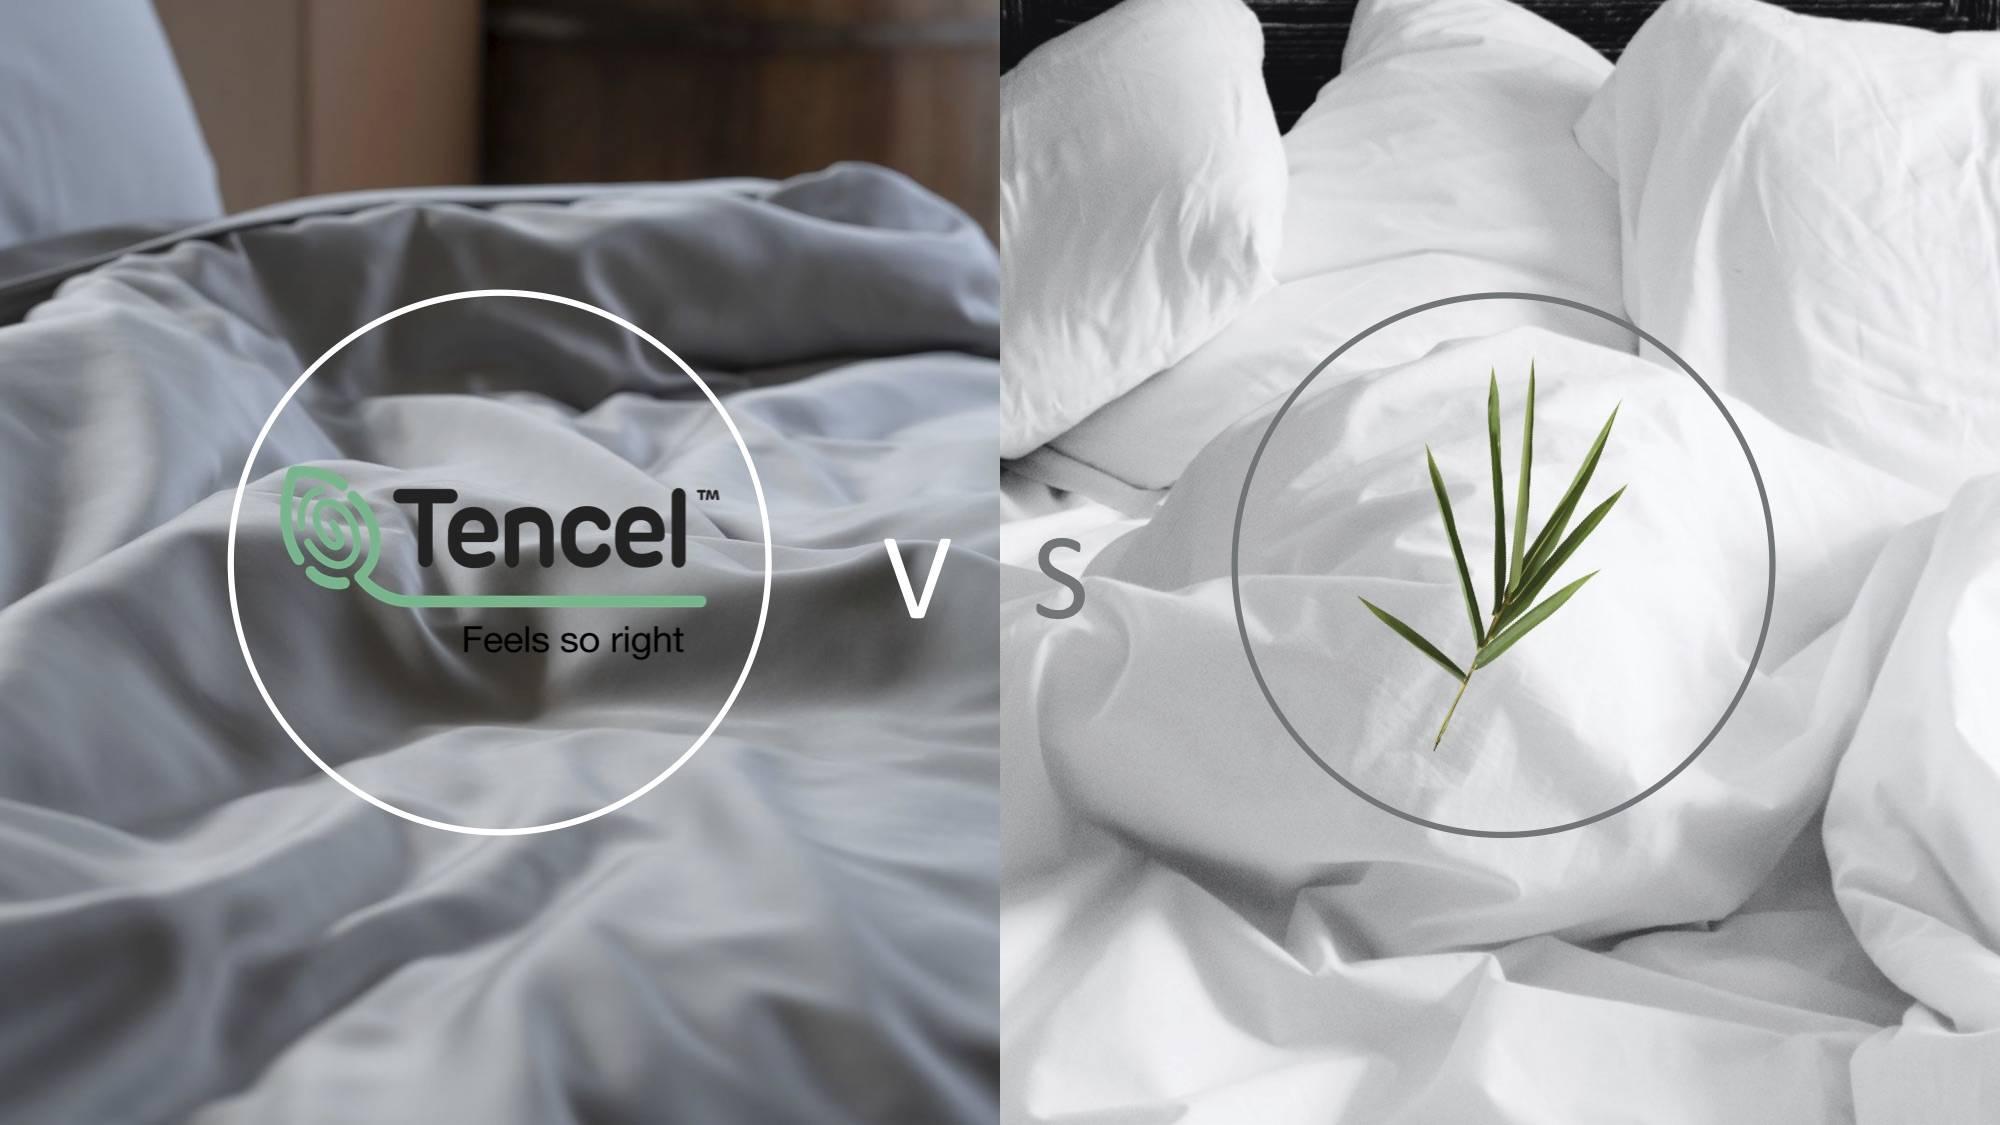 Tencel fabric vs Bamboo fabric